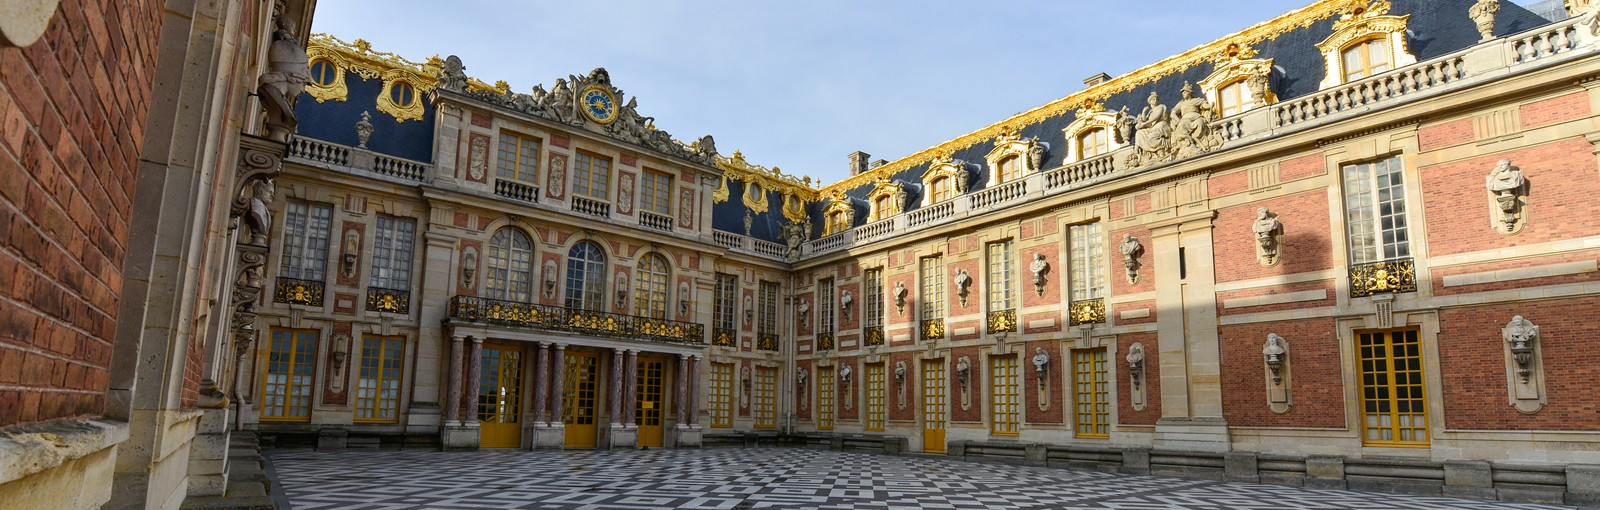 Versailles - La Cour de Marbre